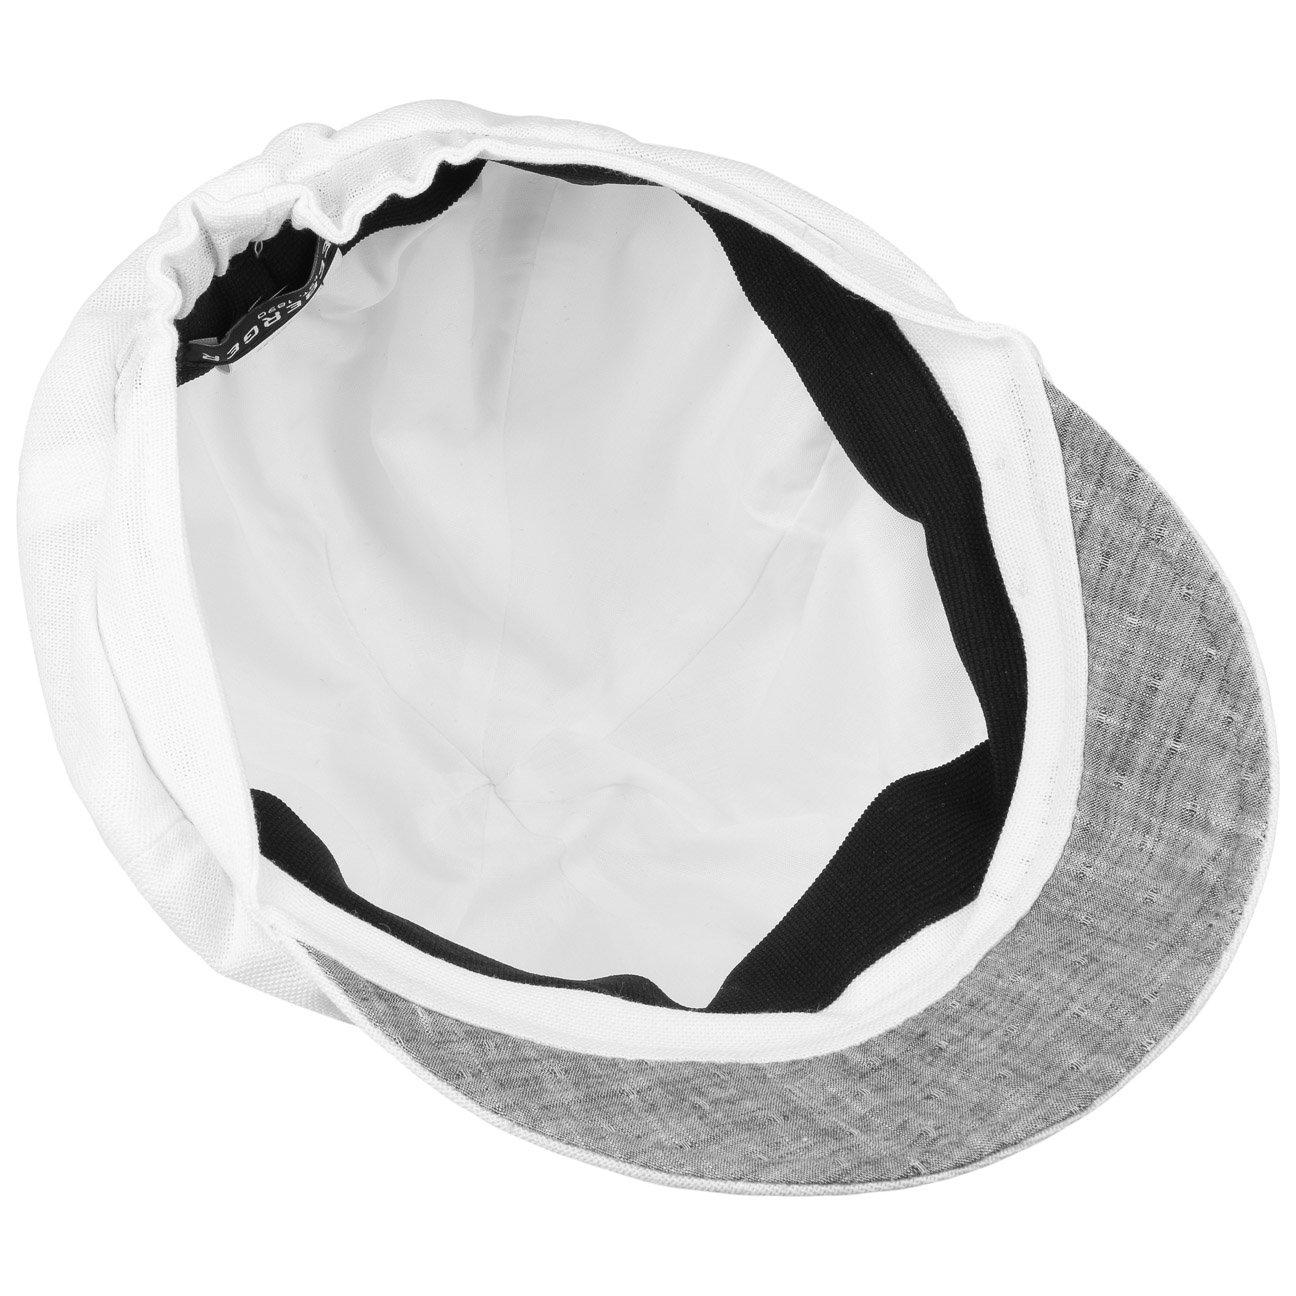 Seeberger Classic Ballonm/ütze Baker-Boy-M/ütze Newsboy-M/ütze Schirmm/ütze Baumwollcap Damencap mit Schirm